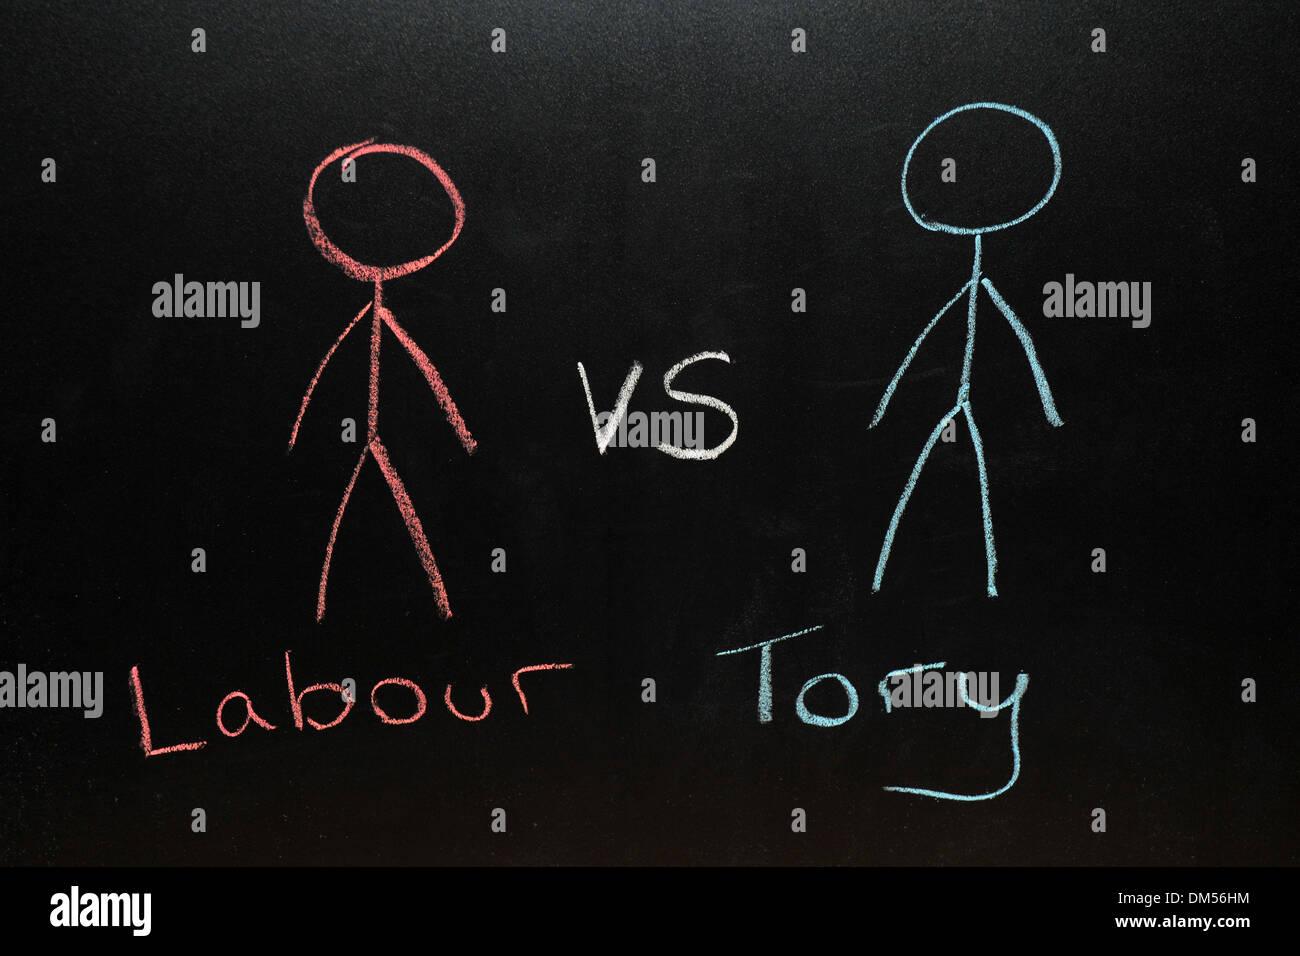 labour vs Tory drawn on a blackboard in chalk. Stock Photo